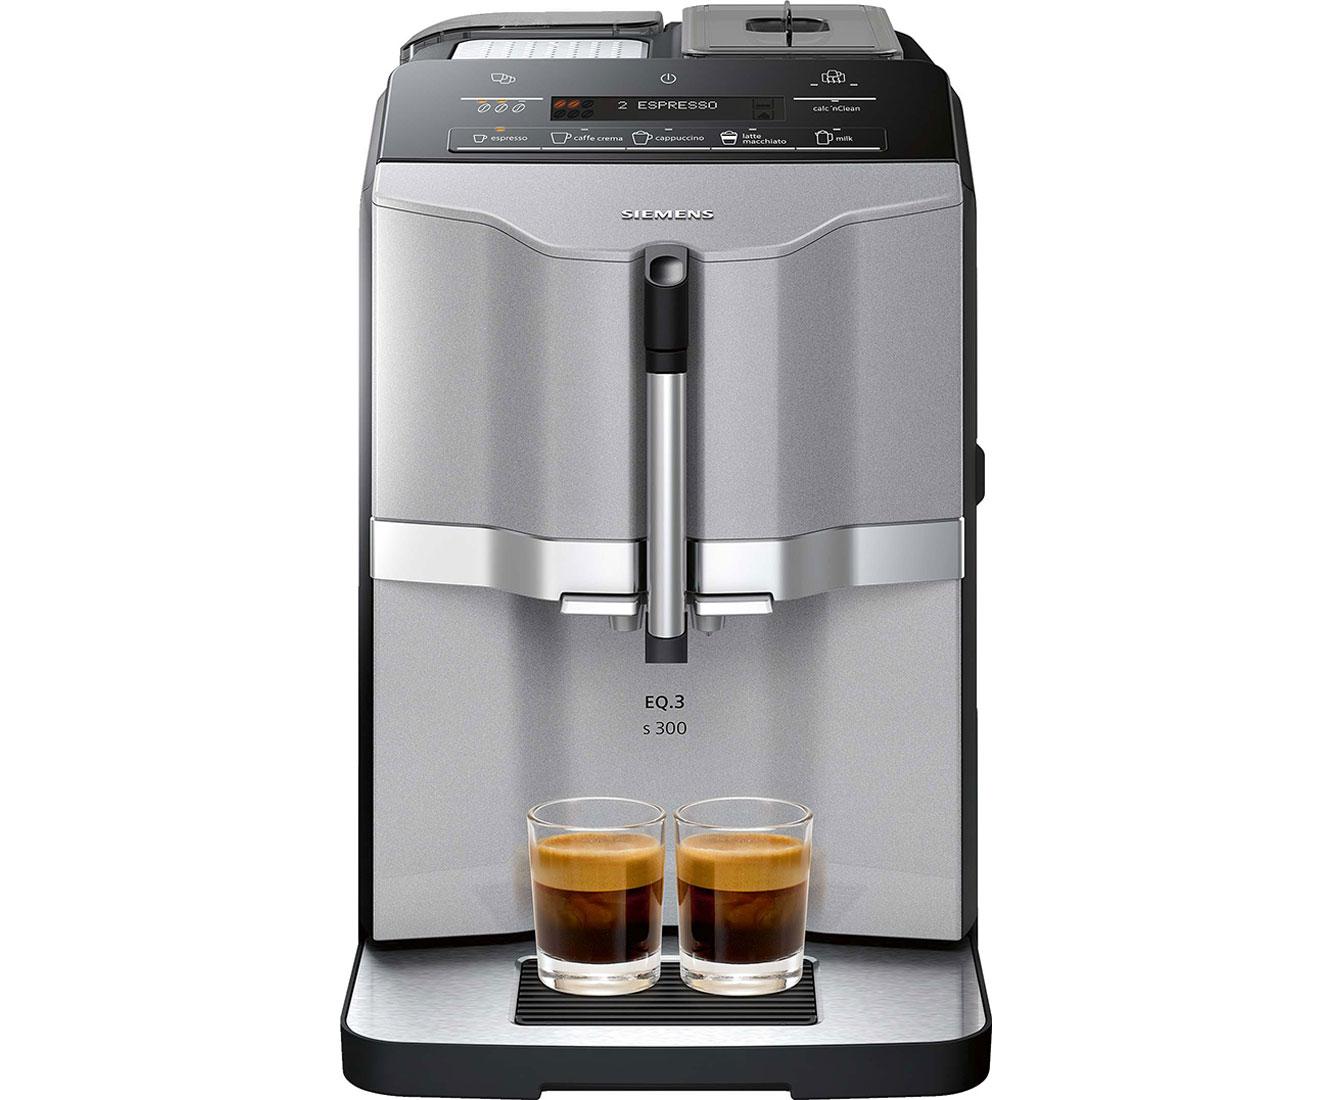 EQ.3 TI303503DE Kaffeemaschinen - Titan